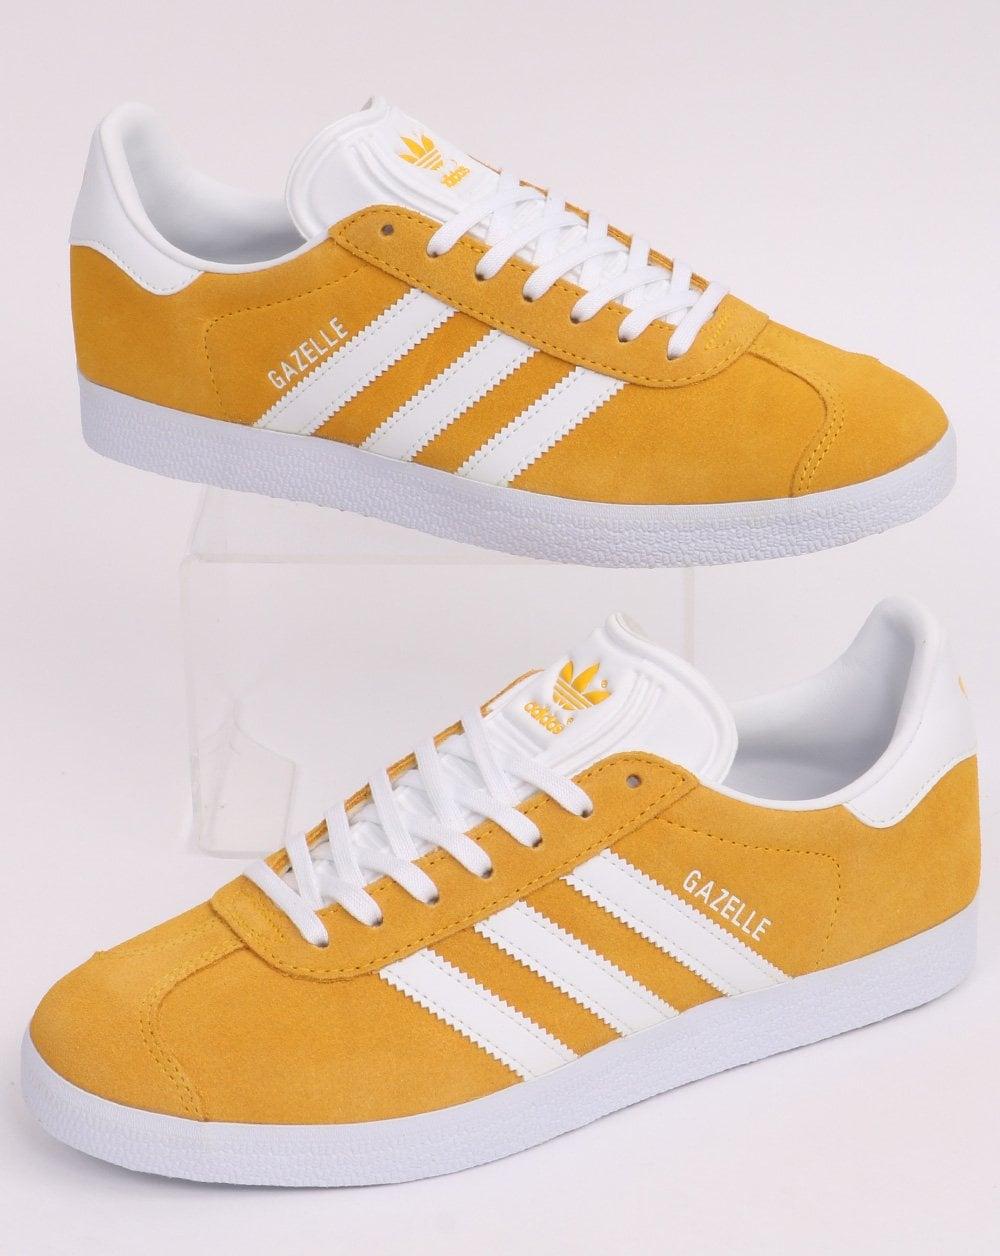 Adidas Gazelle Trainers Golden Yellow/White